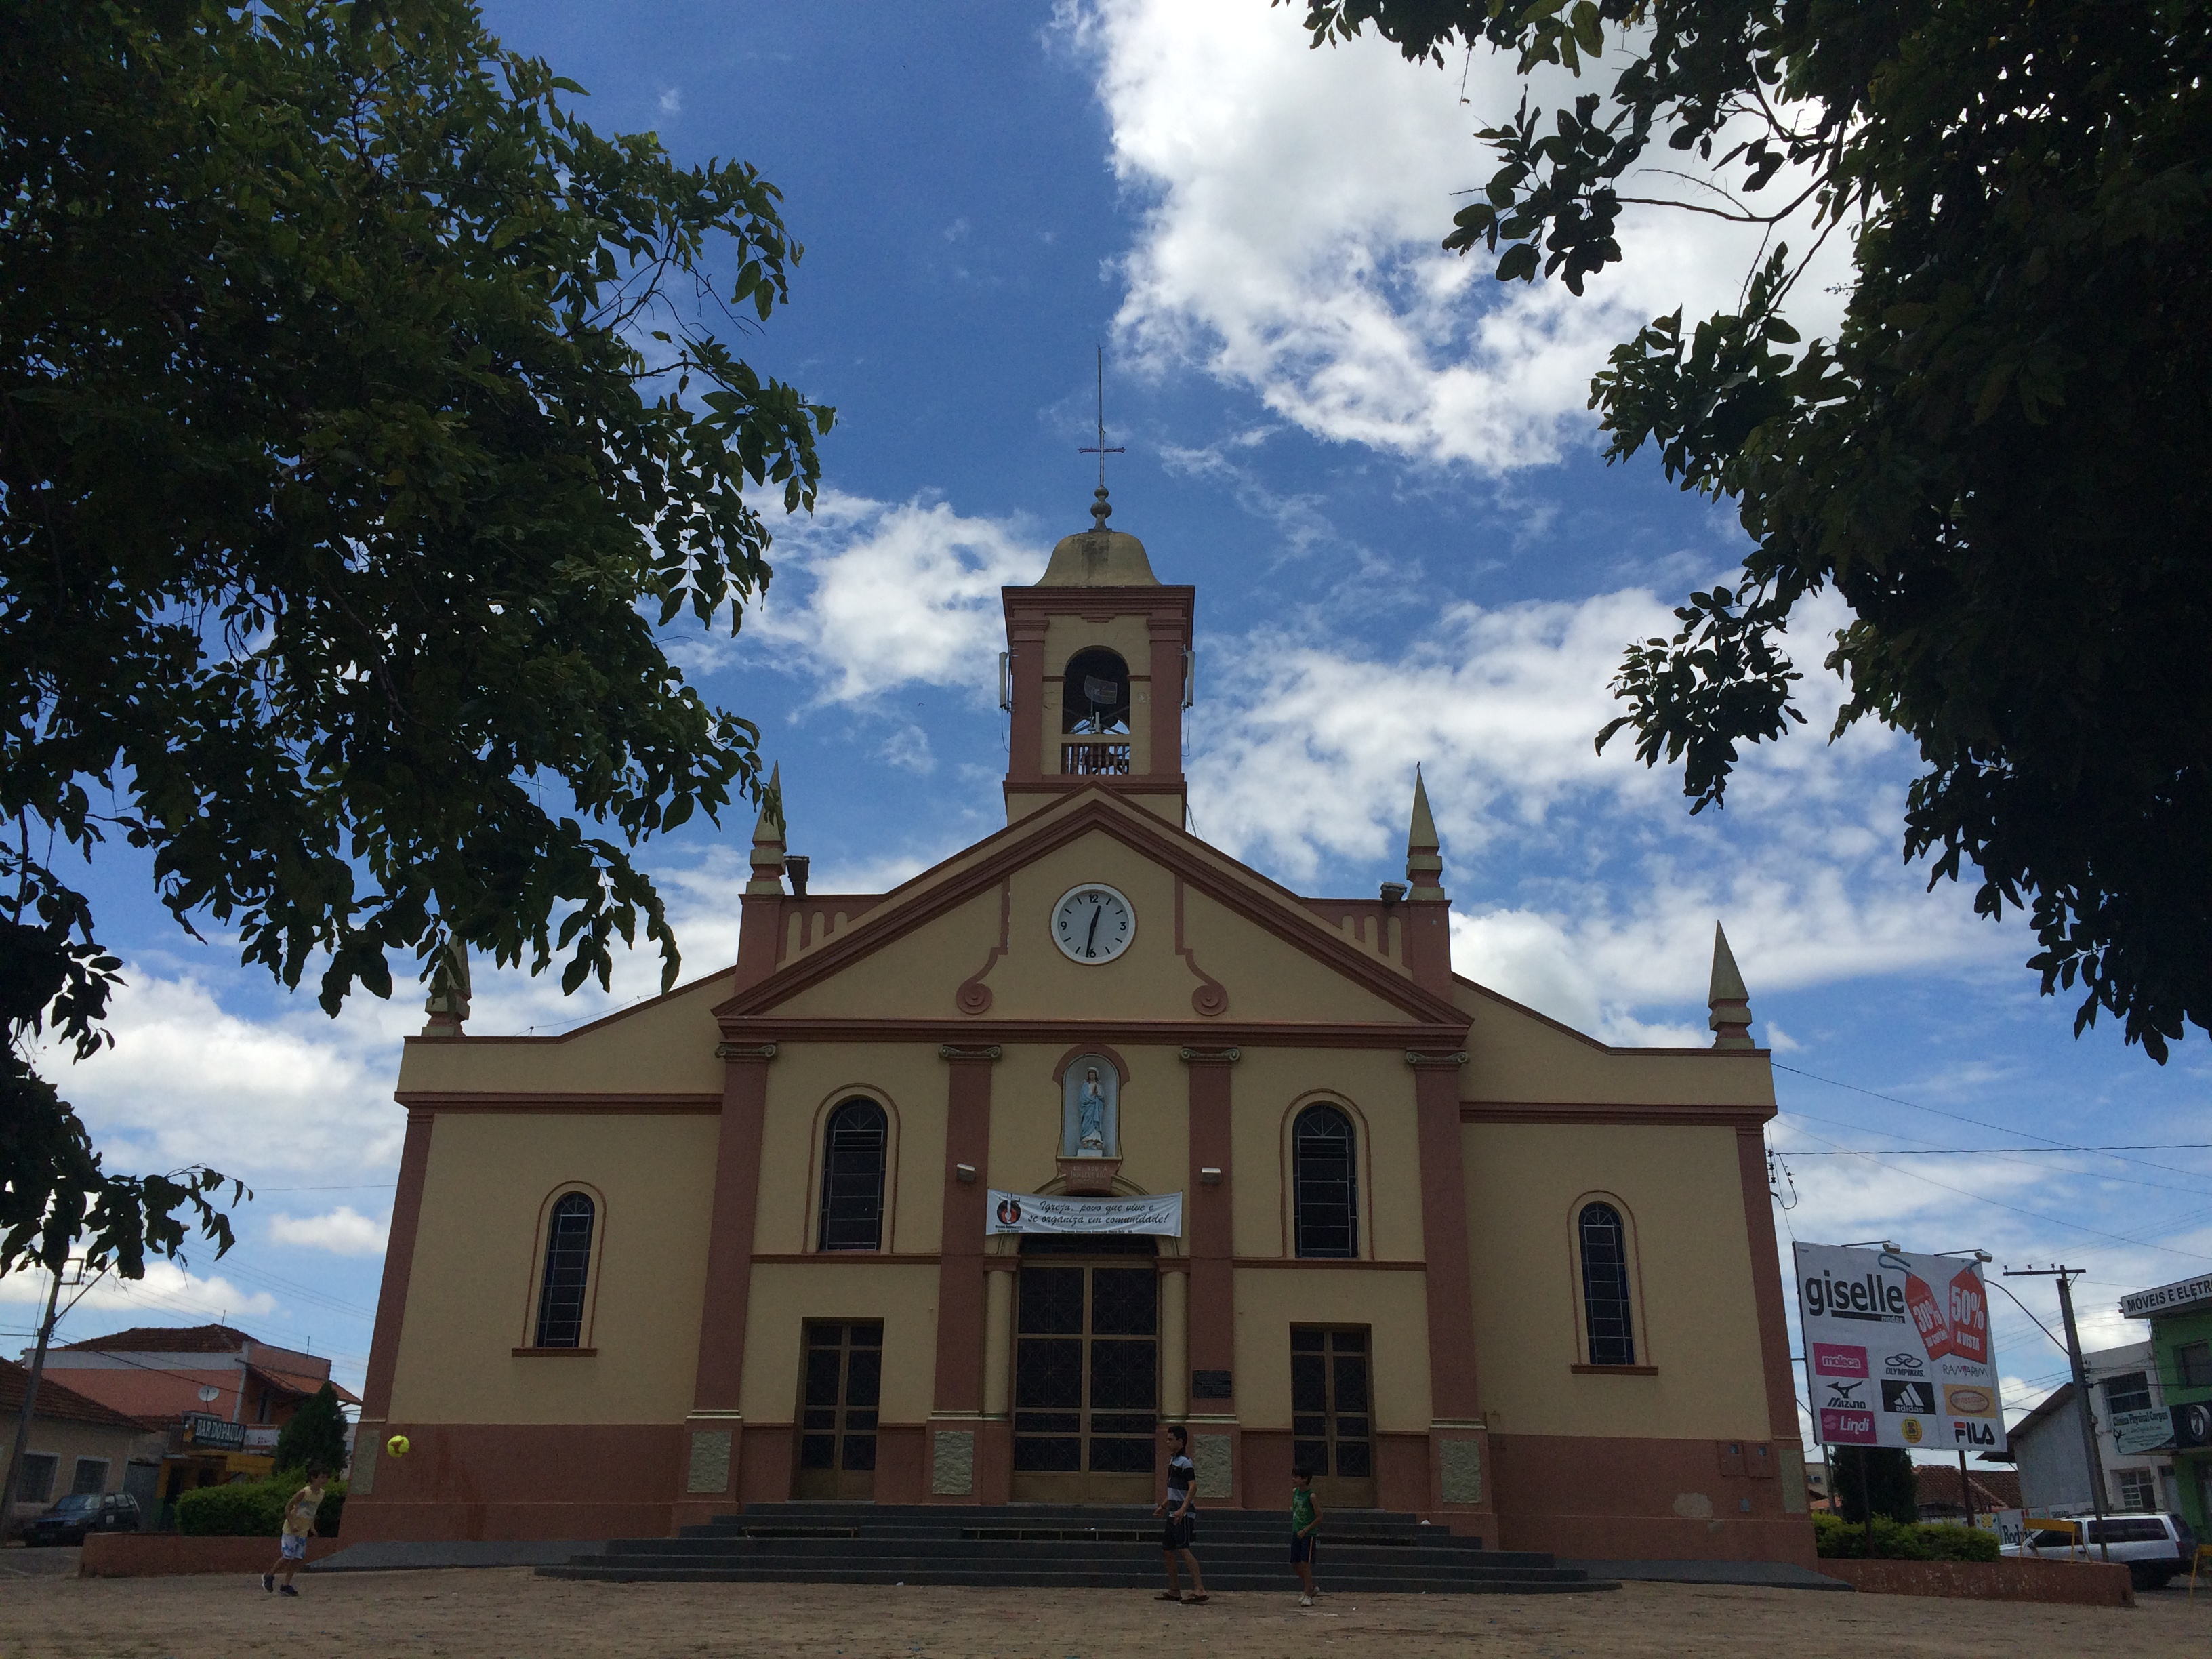 Monte Belo Minas Gerais fonte: upload.wikimedia.org